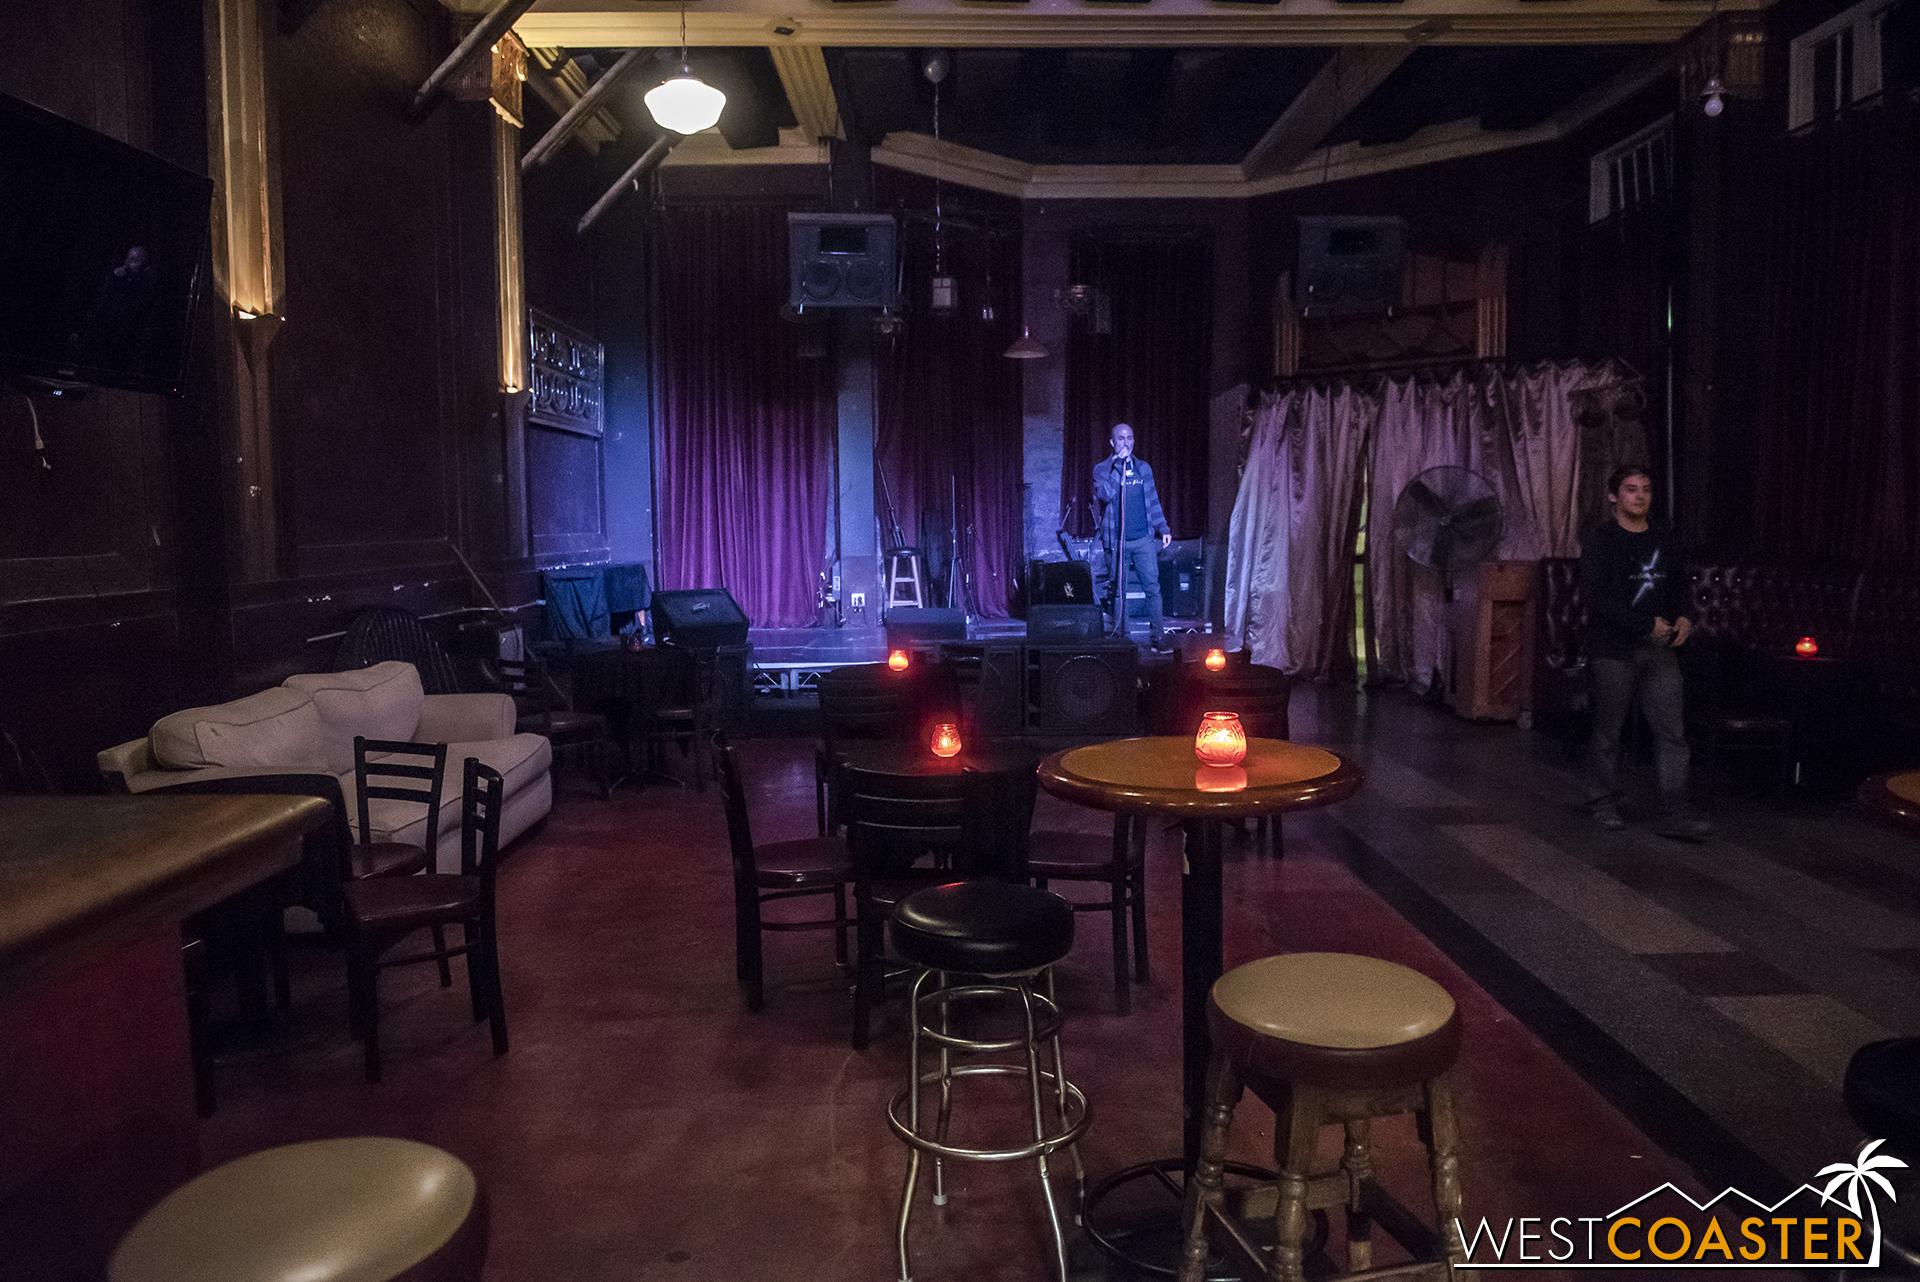 Guests can also duck into the bar next door at the Cafe Club Fais Do-Do.